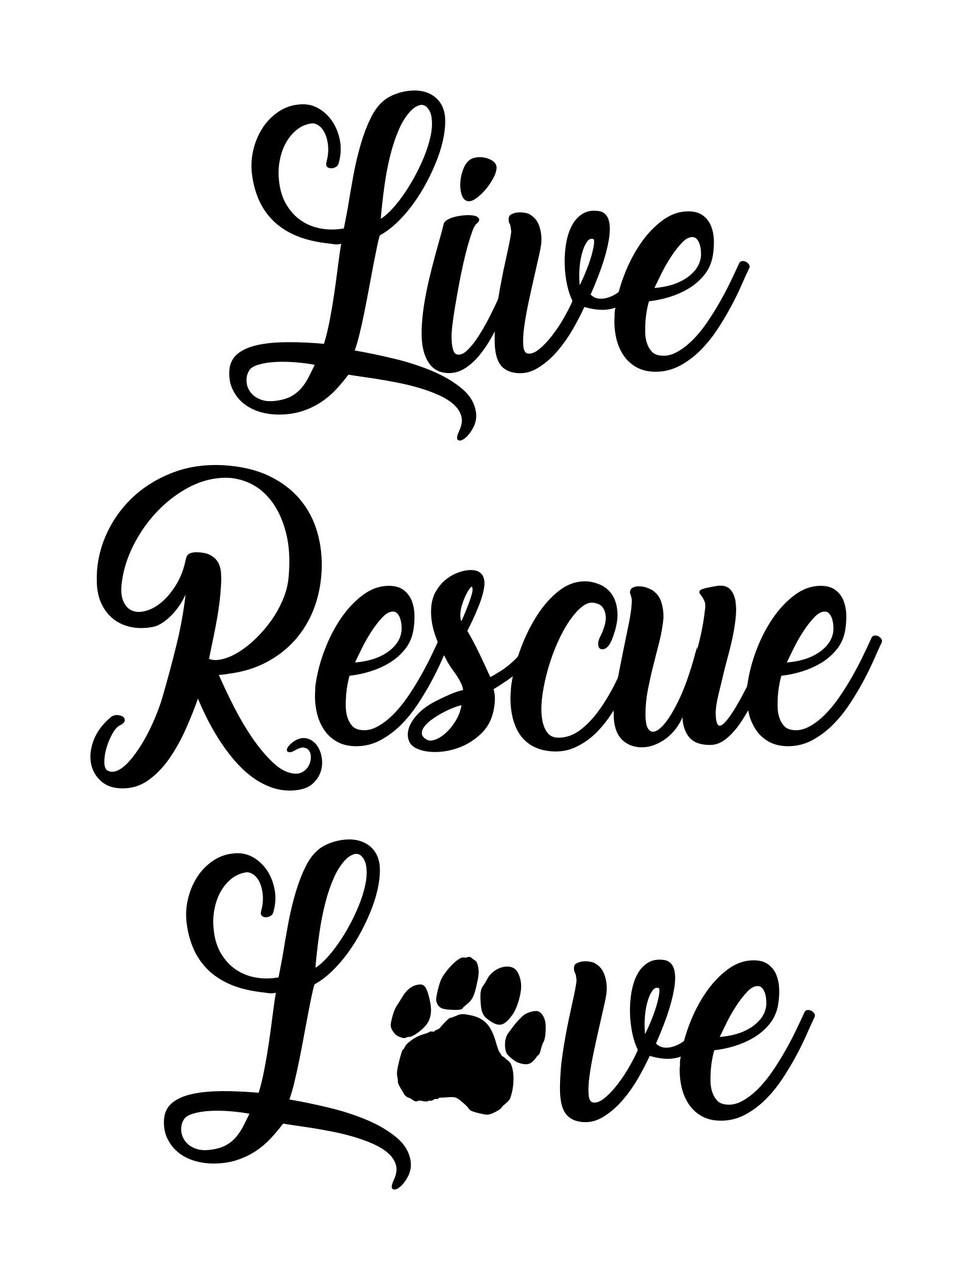 LIVE RESCUE LOVE Vinyl Sticker - Dog Cat Animal Shelter Pawprint - Die Cut Decal